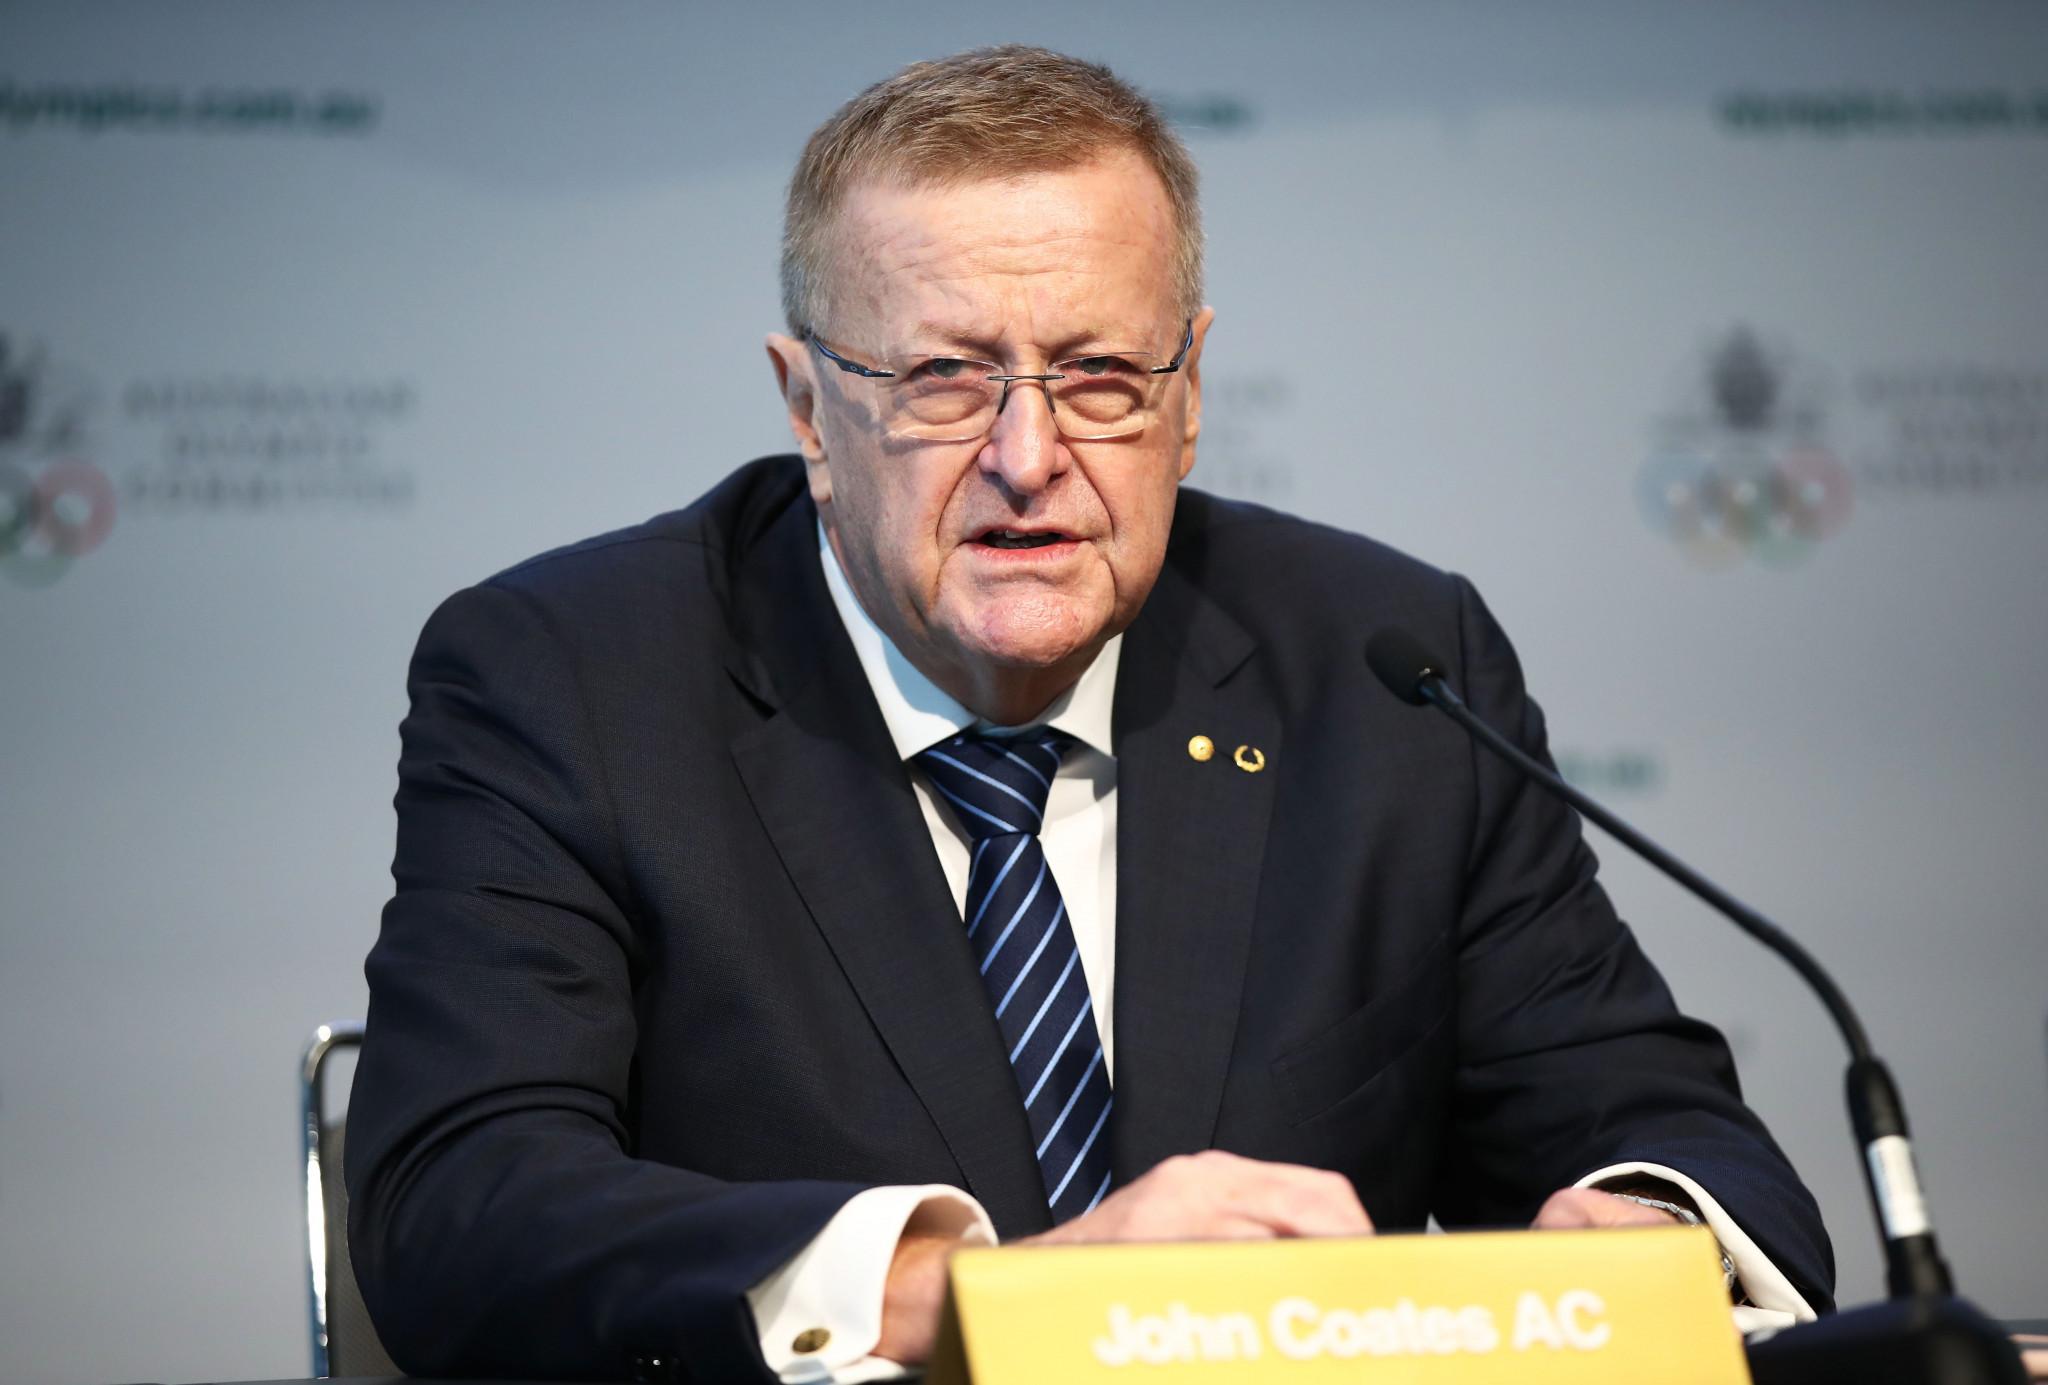 Australian Olympic Committee President Coates slams political rivals in feisty AGM address